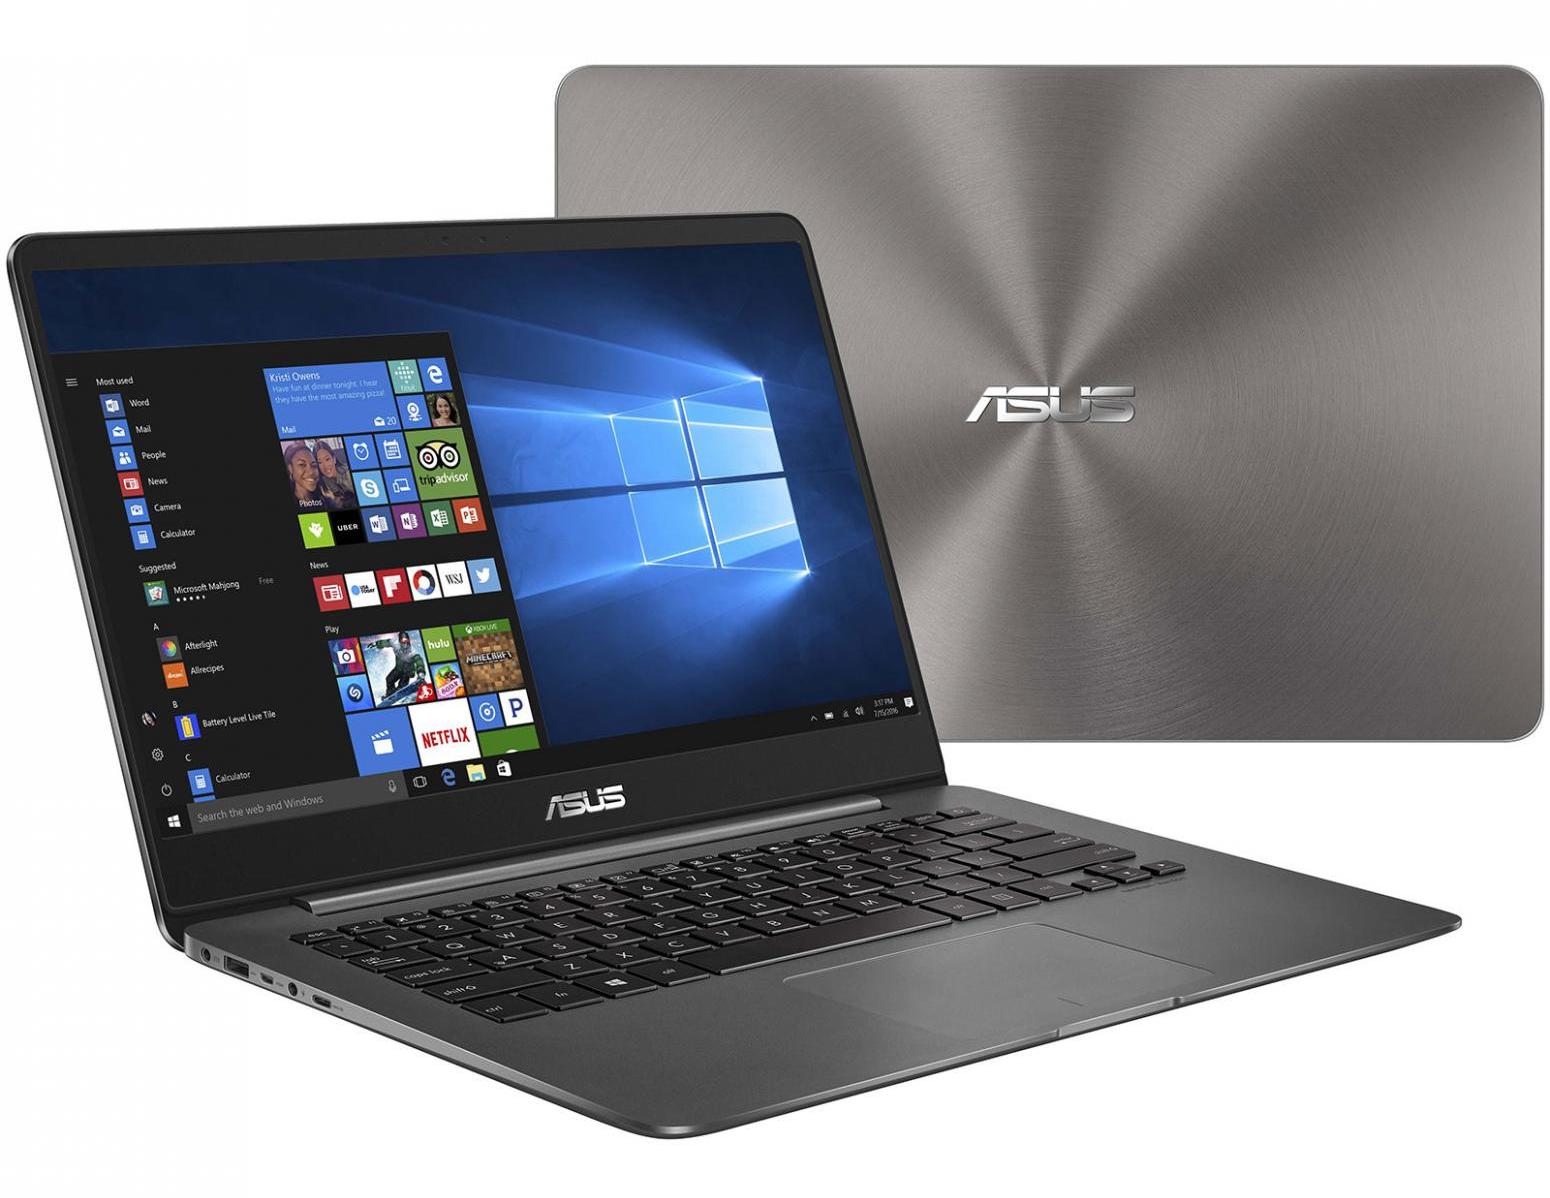 Asus ZenBook UX430UA-GV335T, ultrabook 14 pouces fin i5 Kaby SSD à 760€